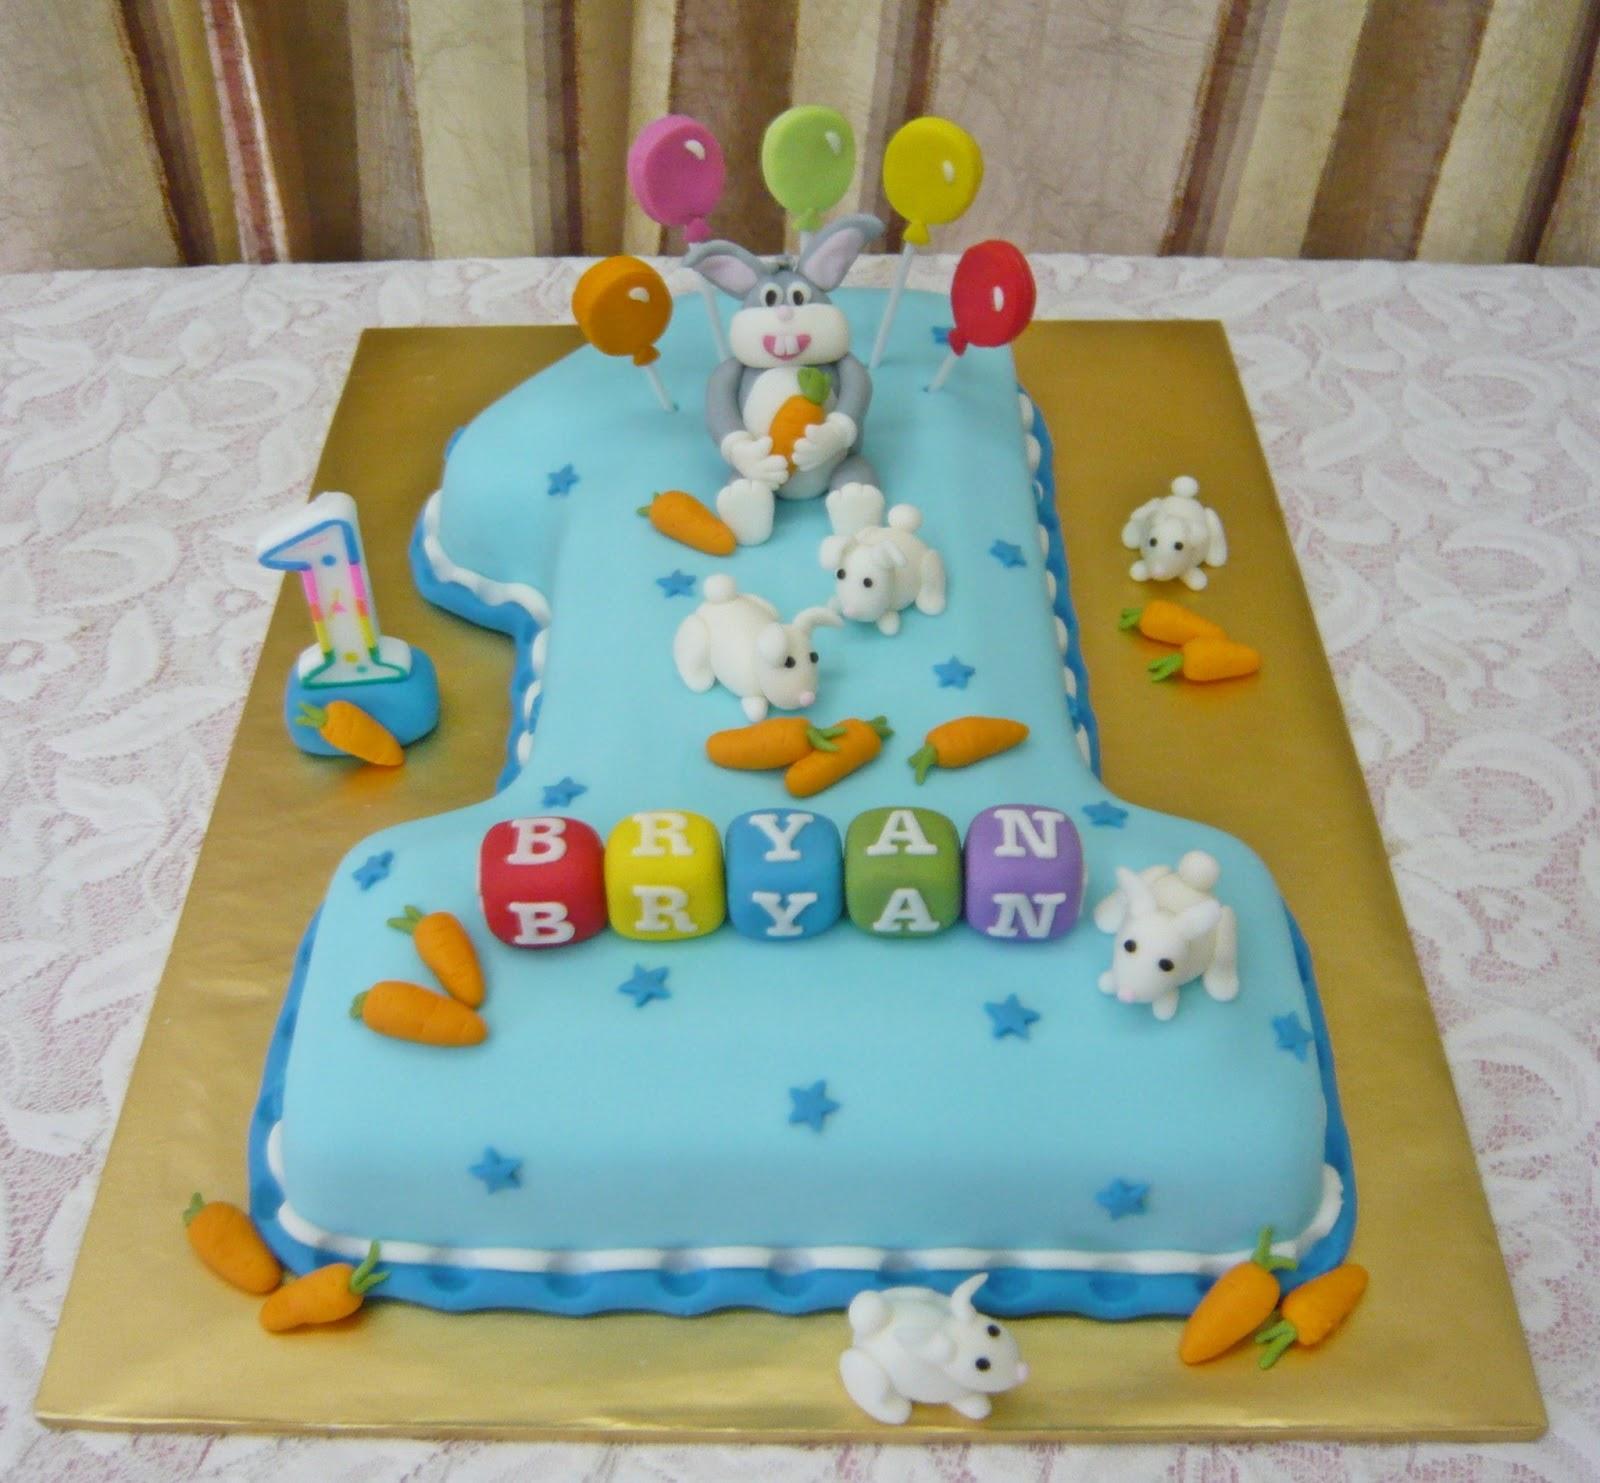 Jenn Cupcakes Muffins No 1 Bugs Bunny Cake